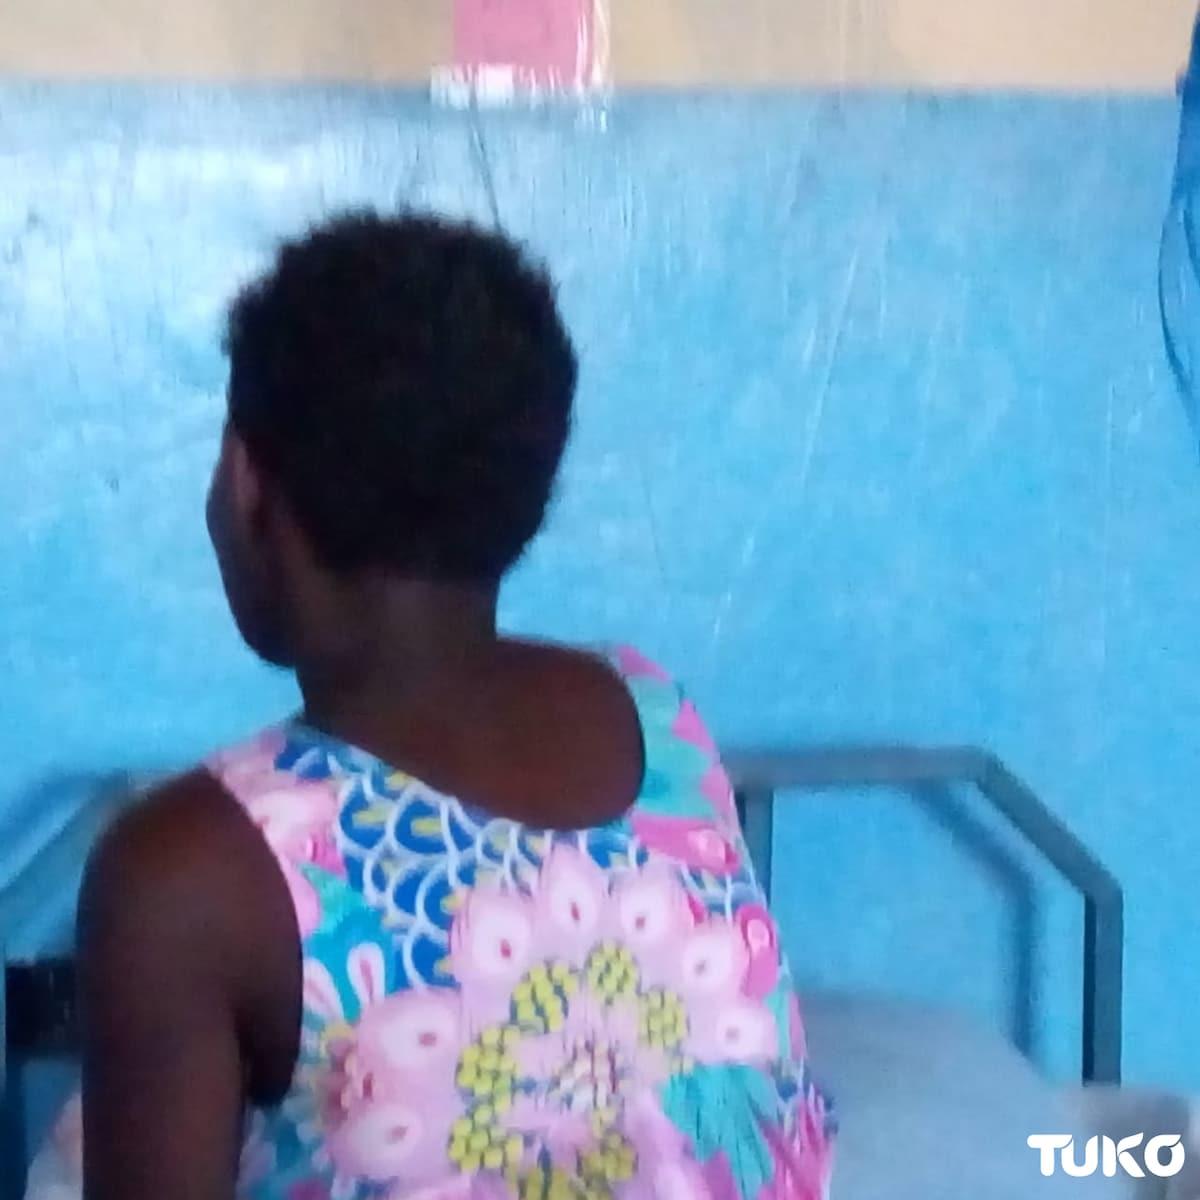 Police launch manhunt for Bungoma teacher on the run for impregnating school girl